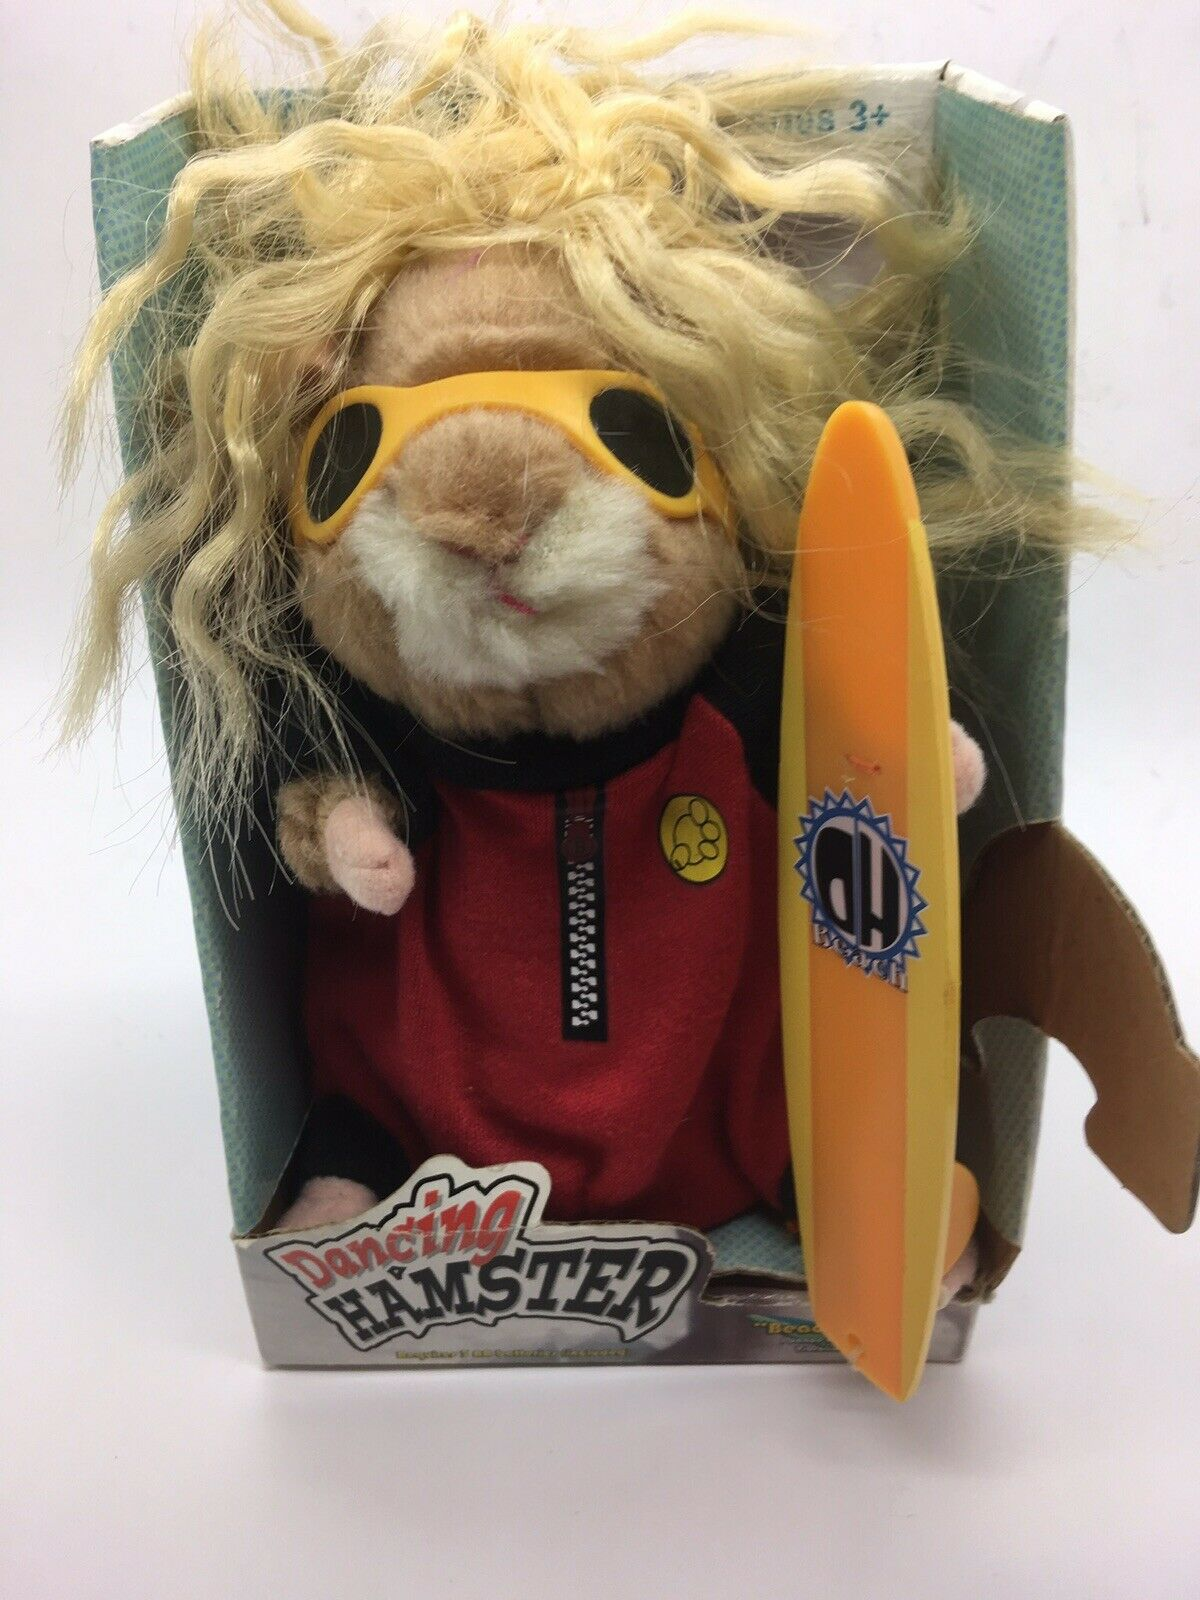 2003 Gemmy Dancing Hamster Beach Bum Surf Dude Sings Dances To Good Vibrations